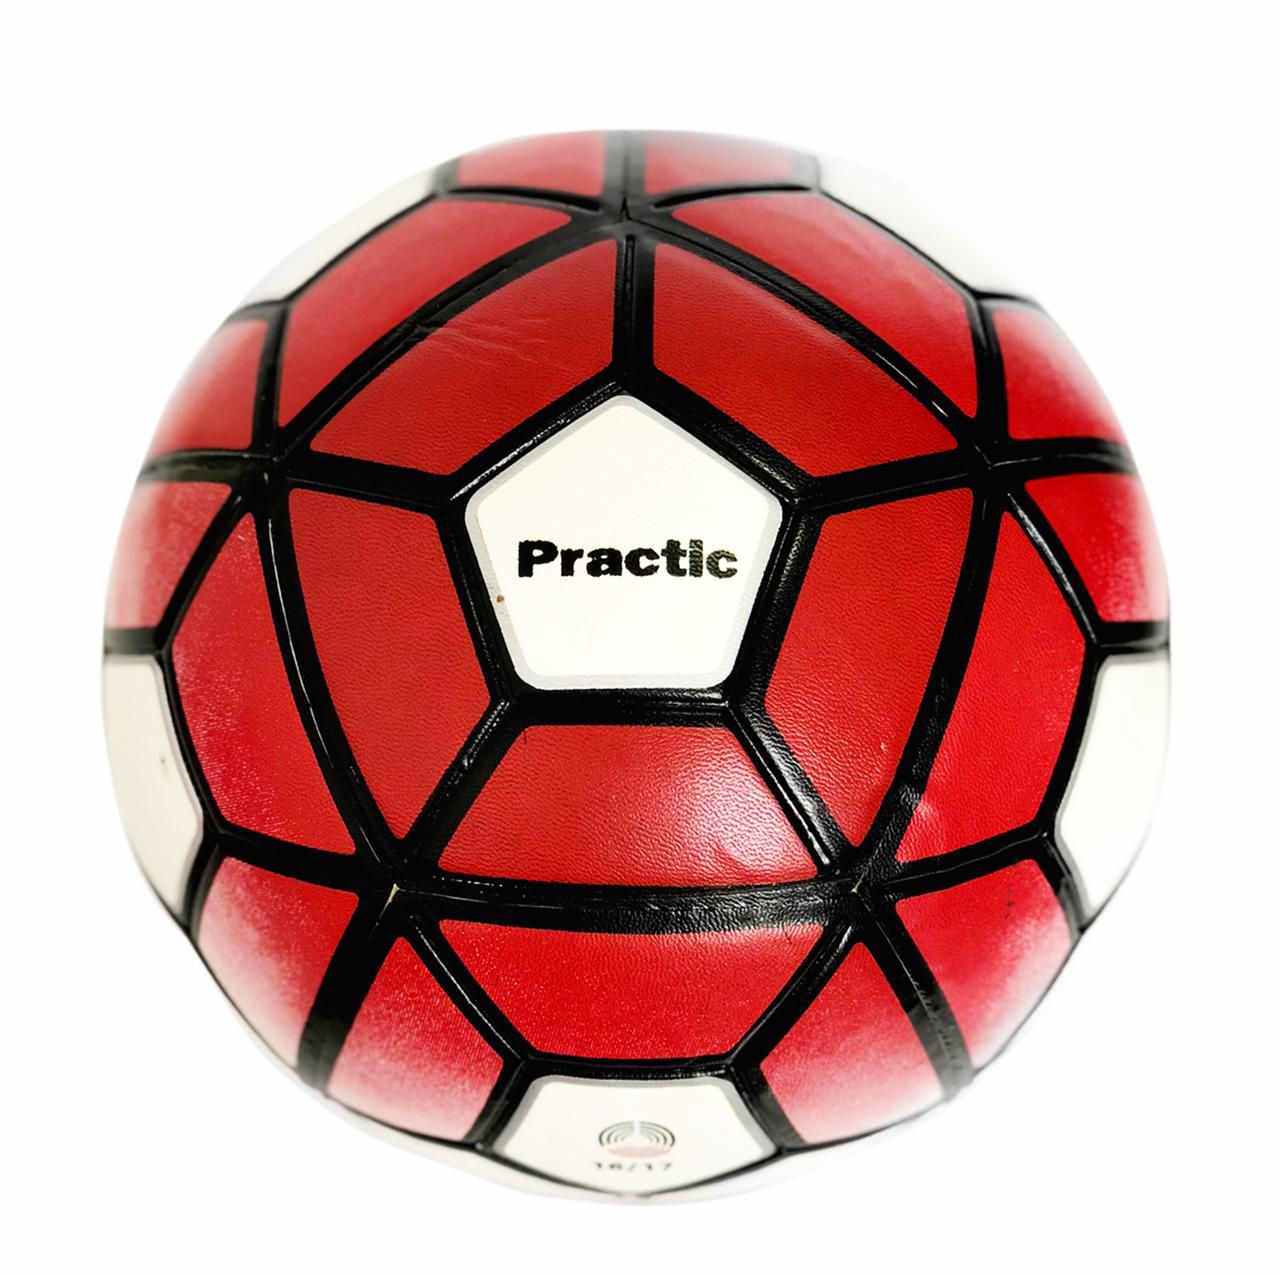 М'яч футбольний Practic Premier League (Size 5)